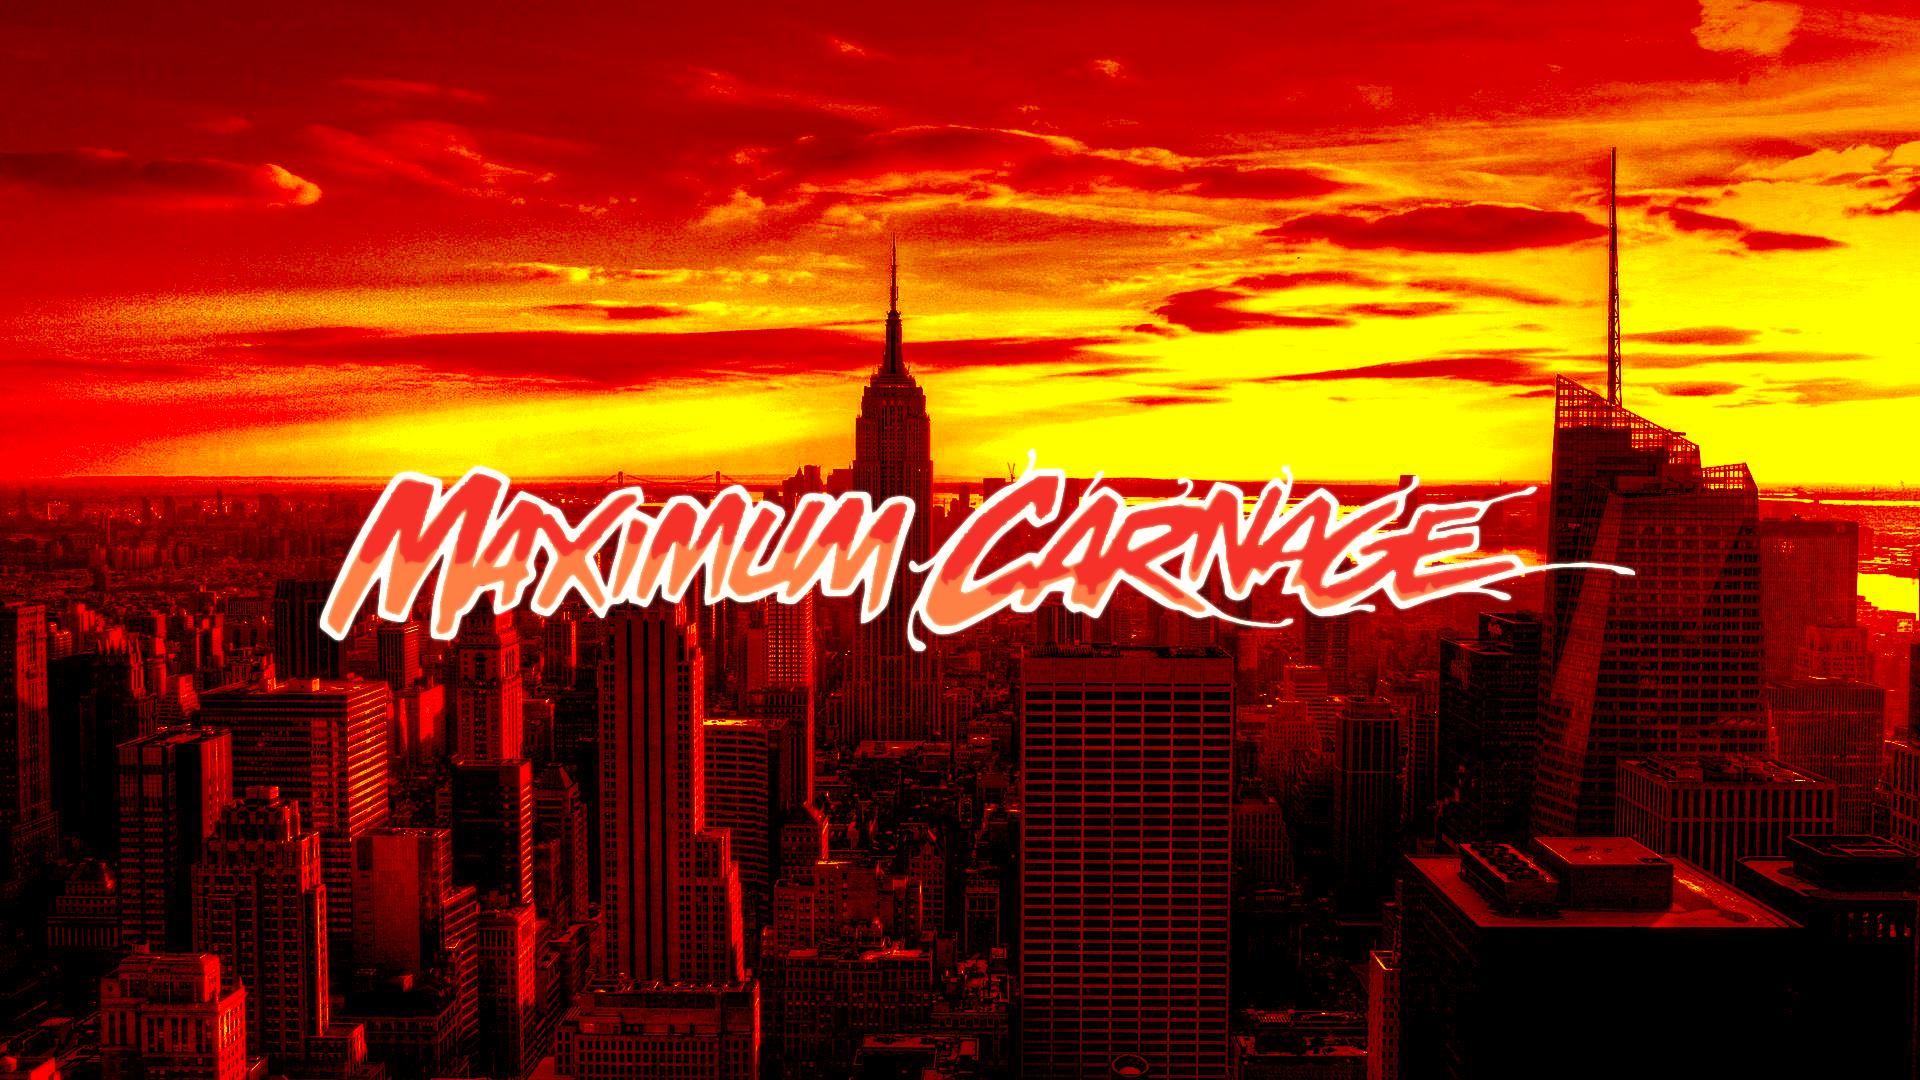 Maximum Carnage Wallpaper Hd Maximum carnage cover no 1920x1080